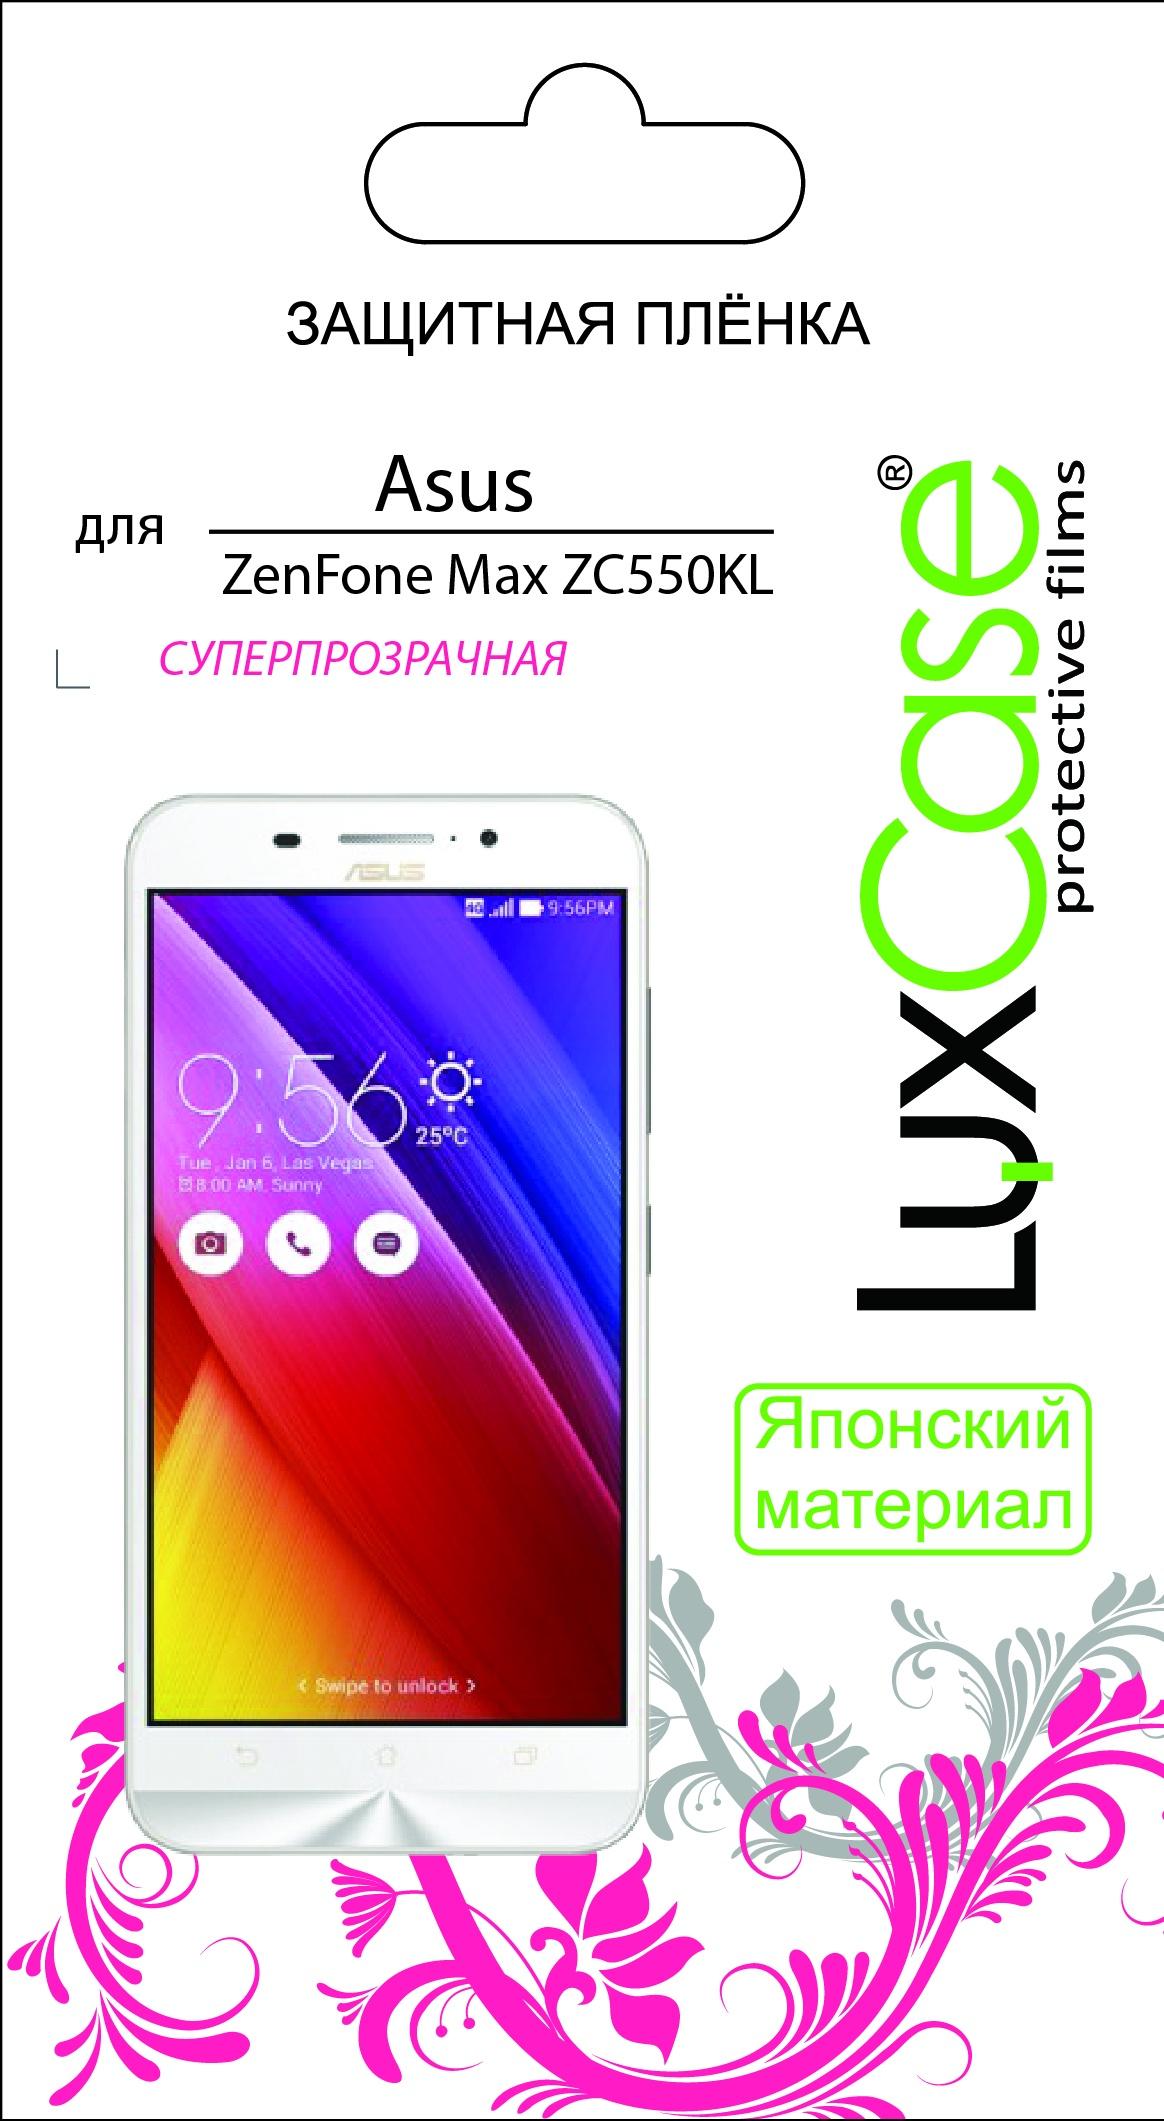 цена на Пленка ASUS ZenFone Max ZC550KL / суперпрозрачная